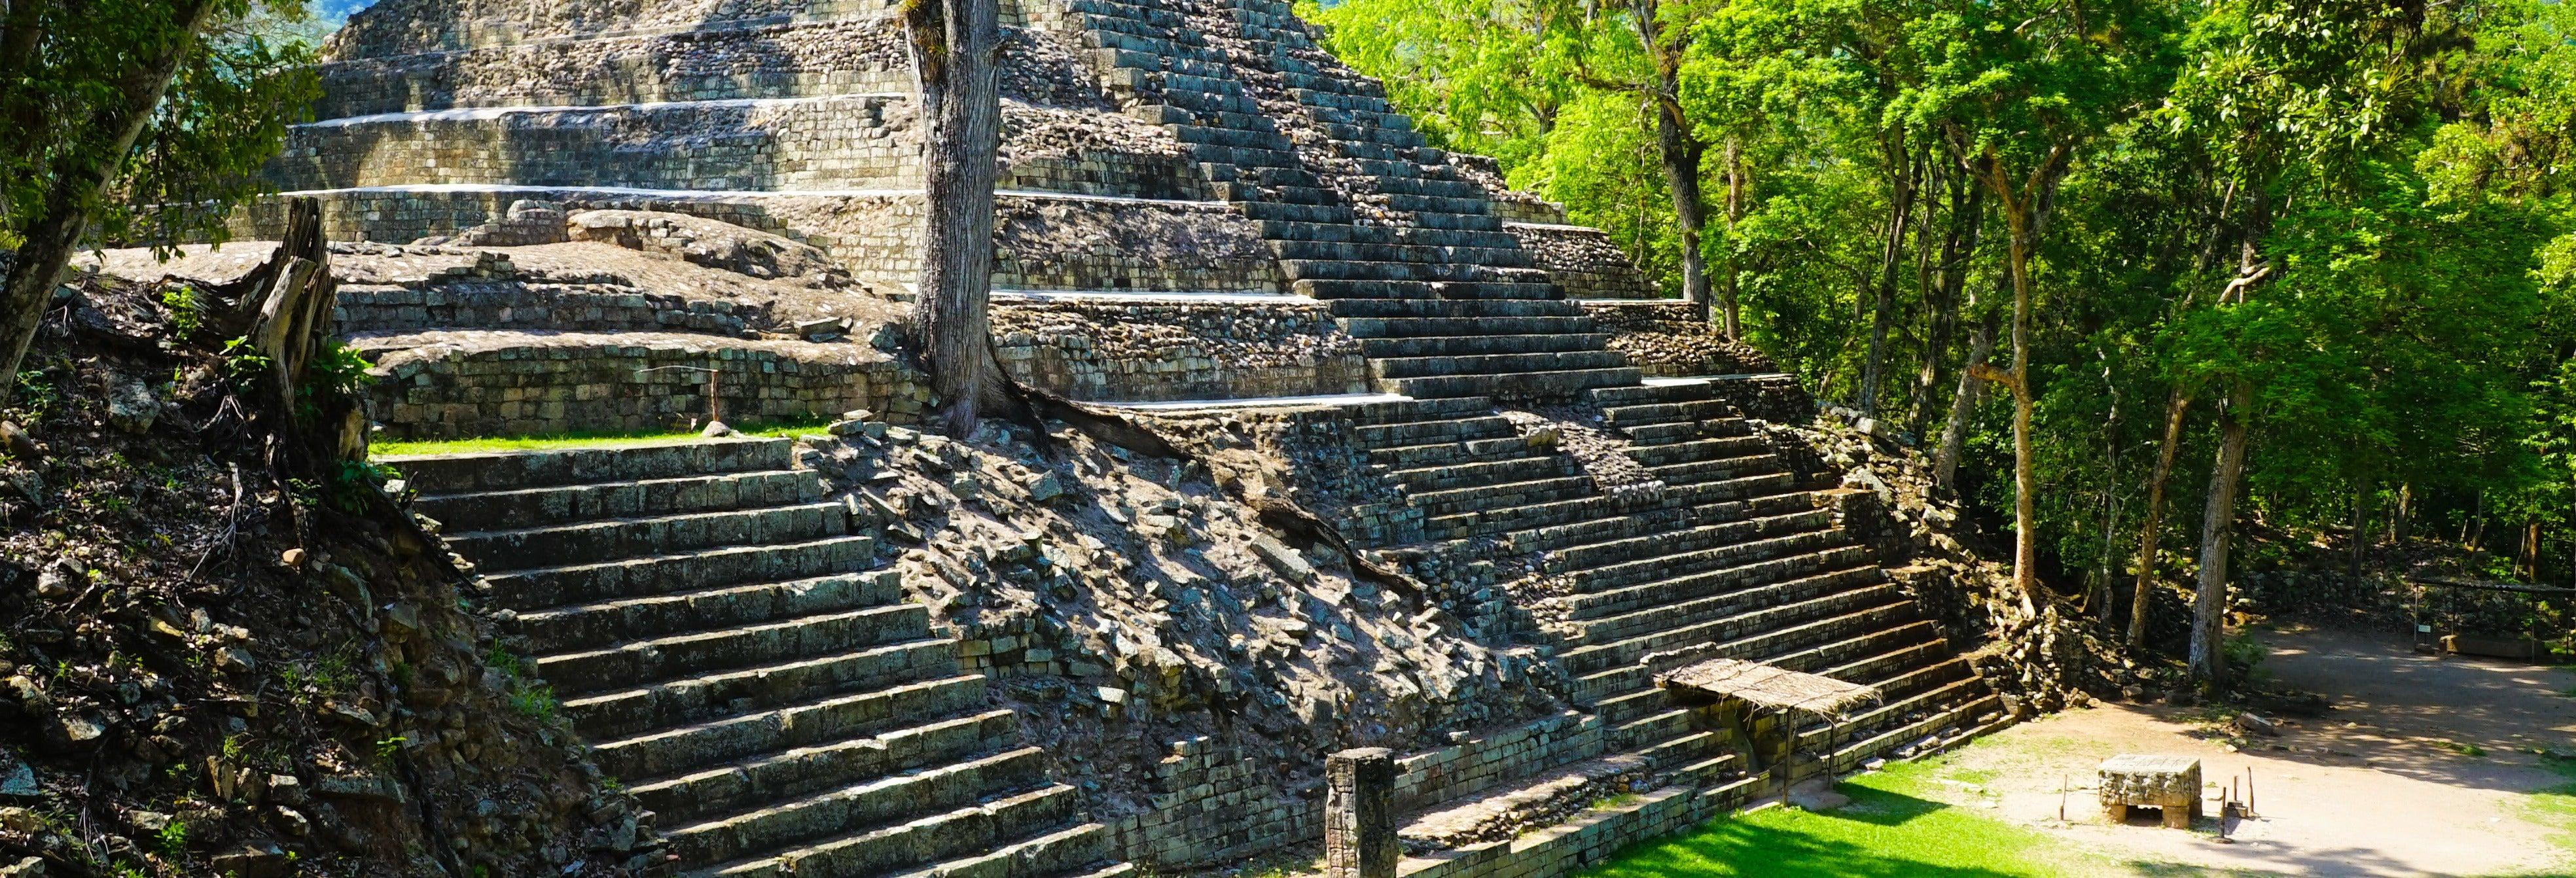 Excursão a Copán